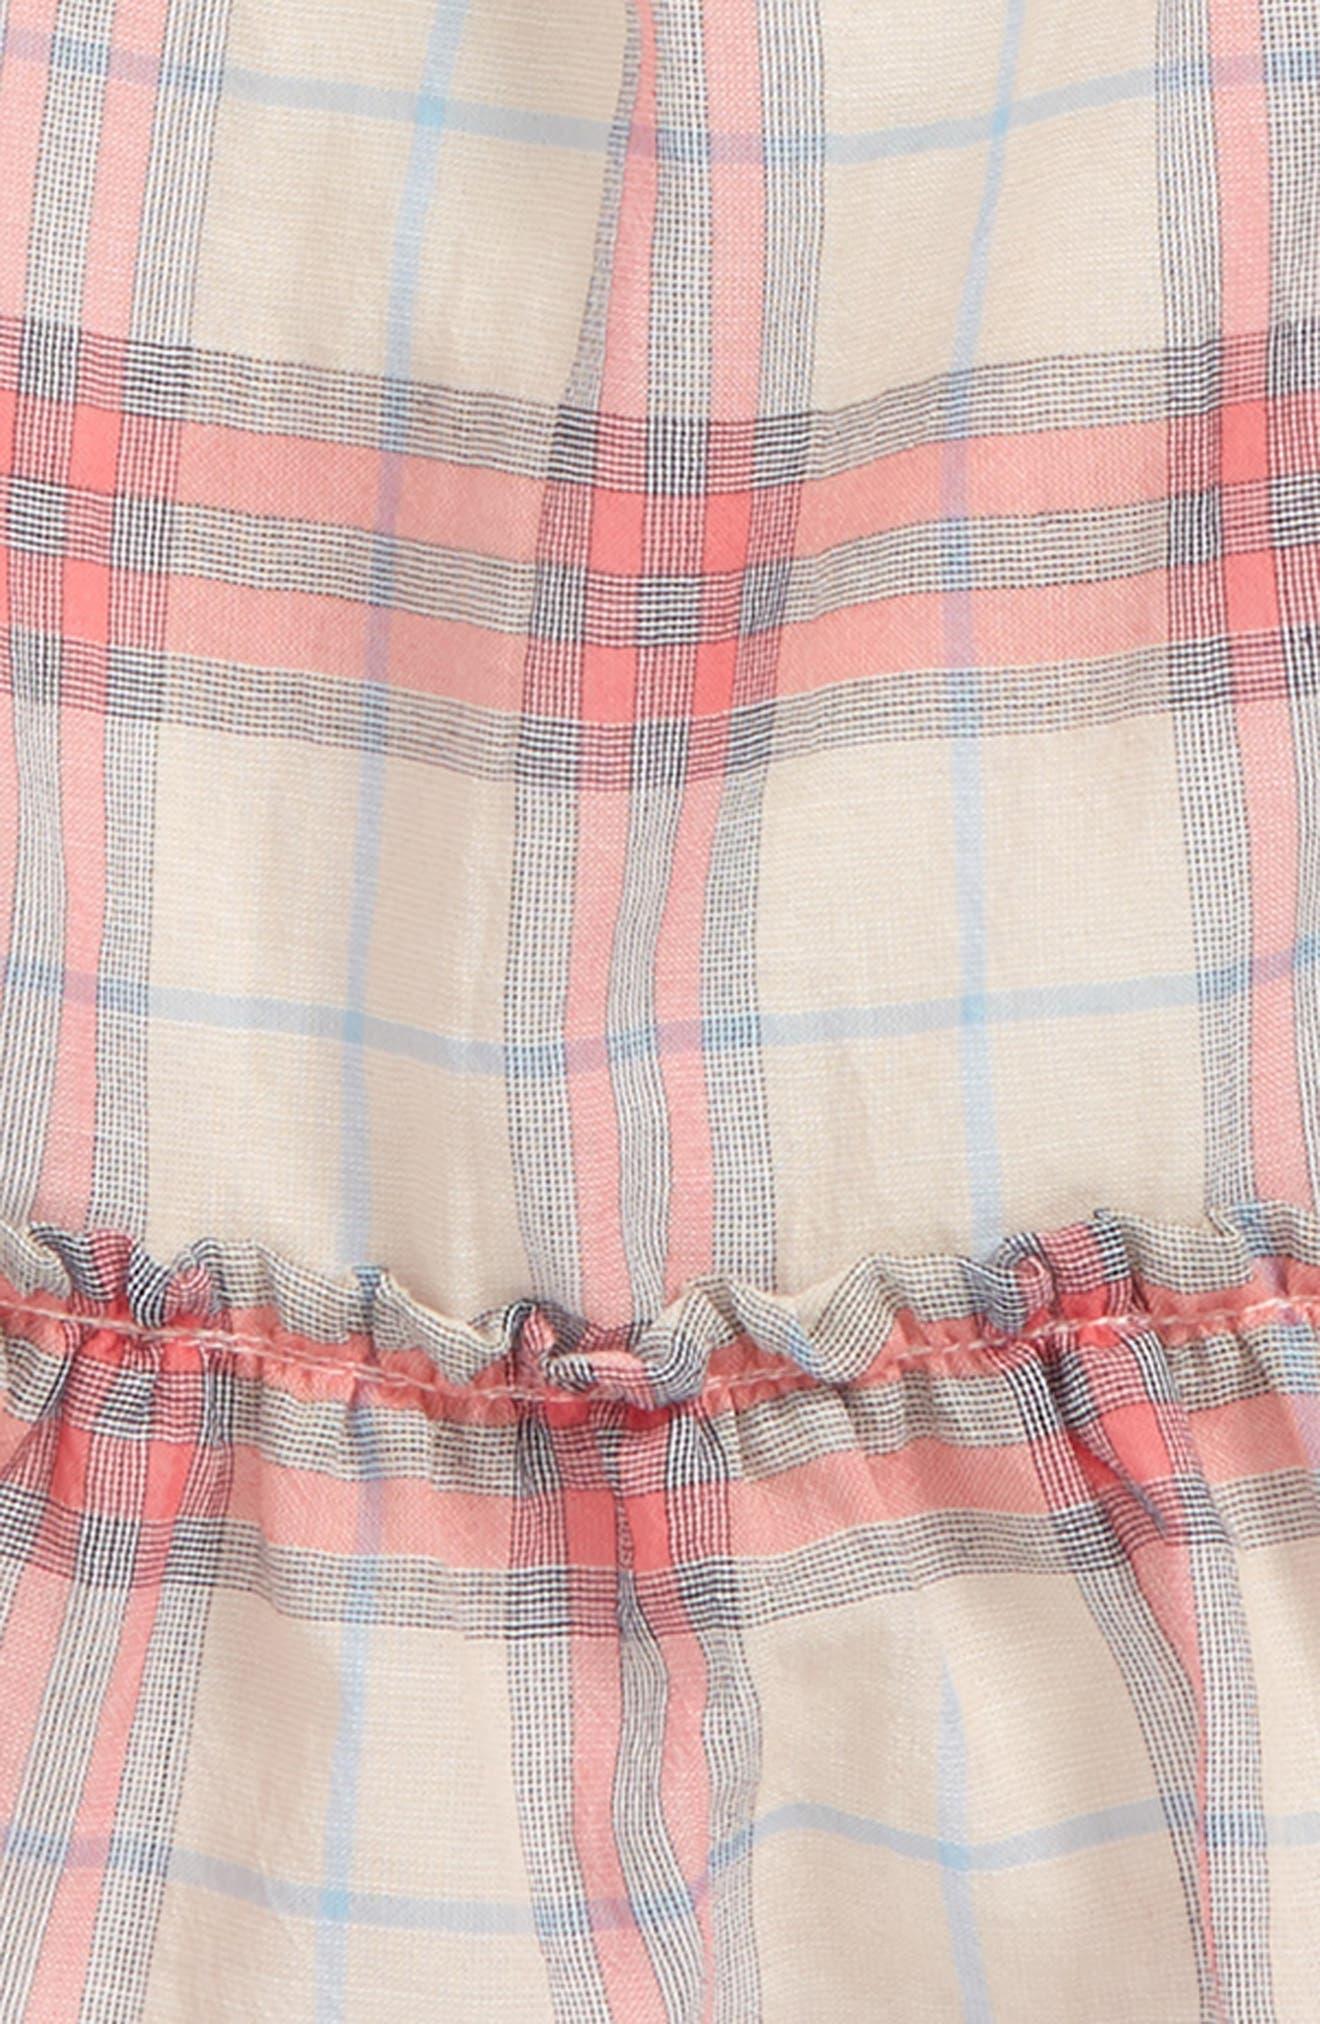 Tania Check Dress,                             Alternate thumbnail 2, color,                             Bright Coral Pink